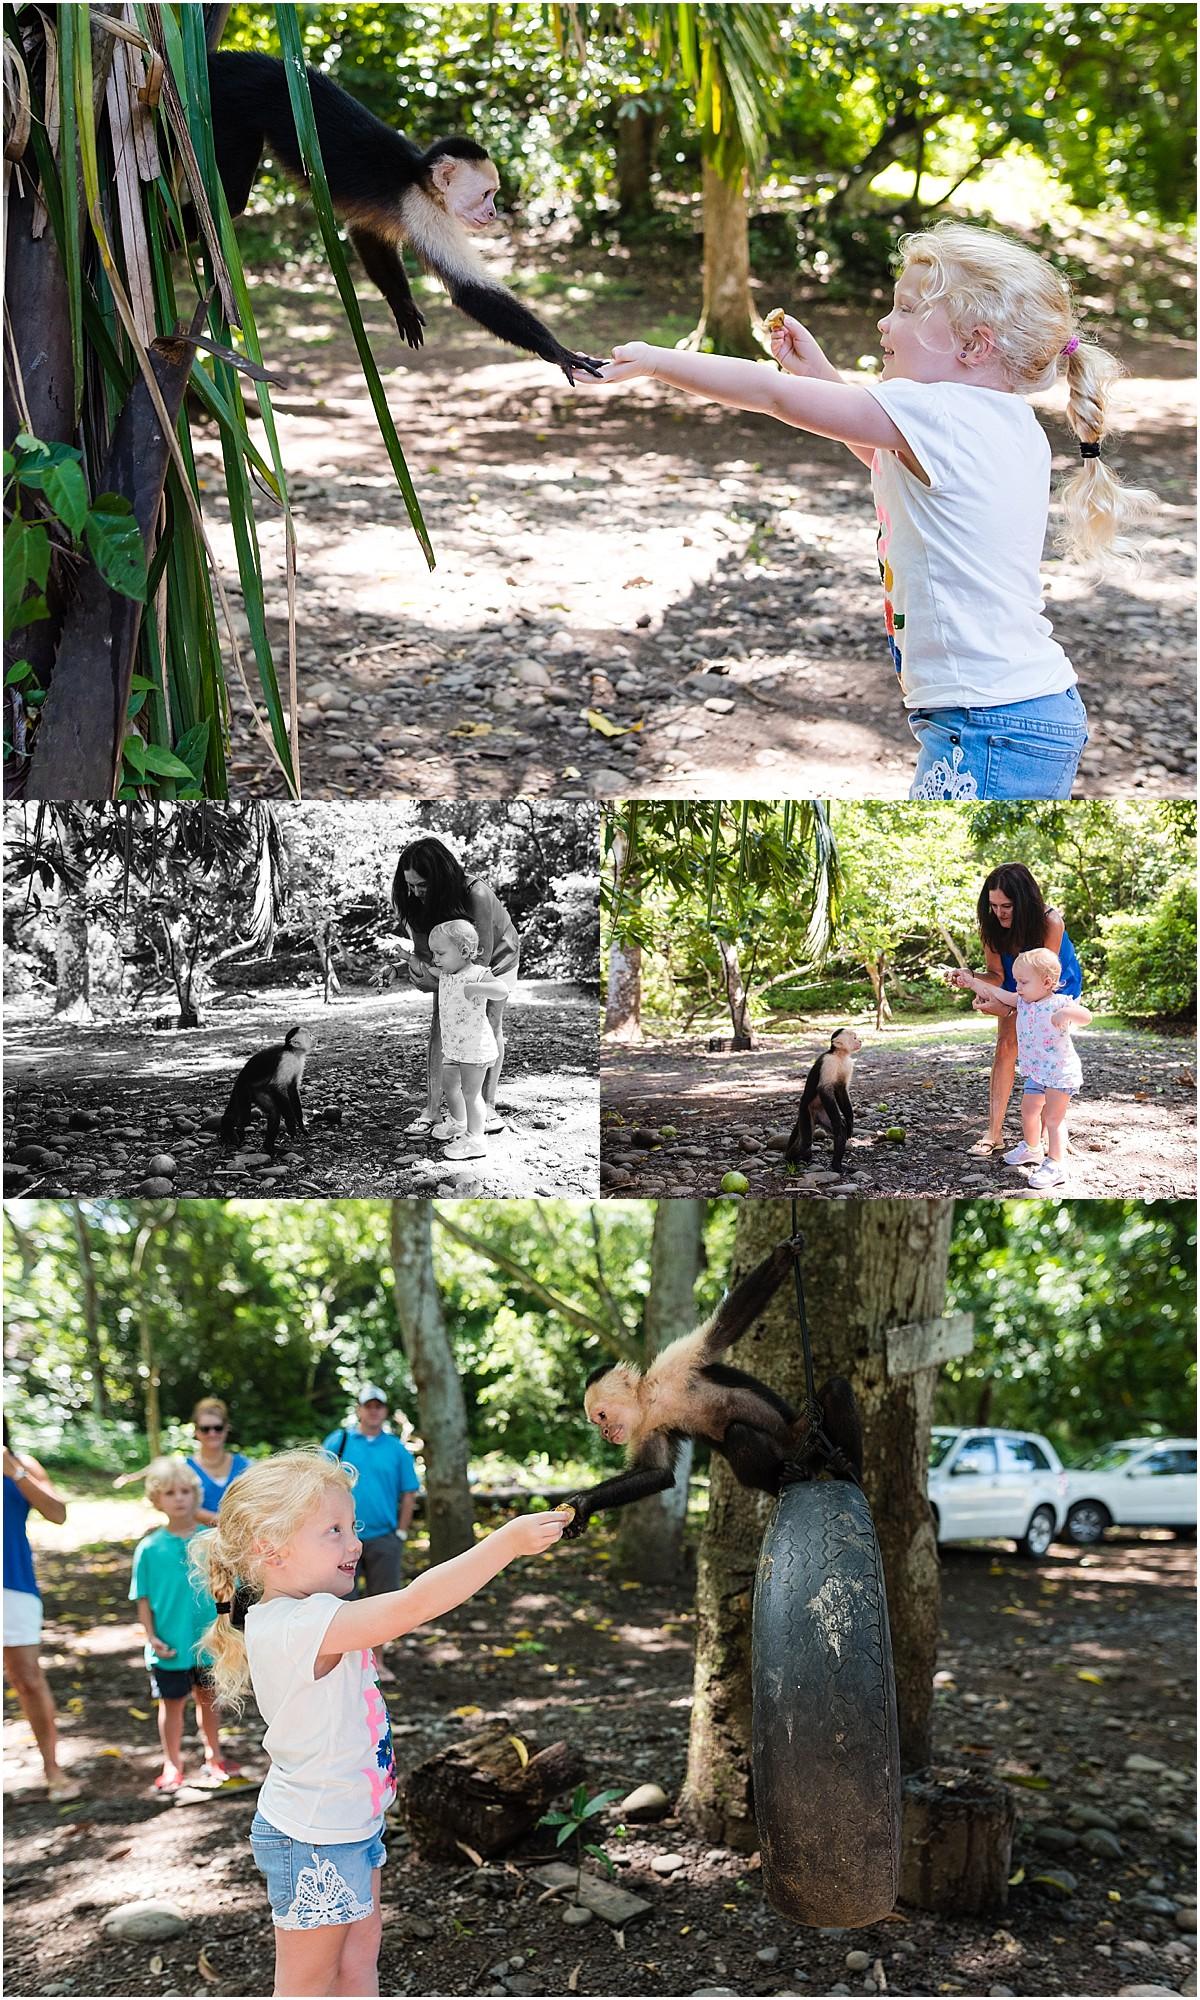 Ashley_Rogers_Photography_South_Florida_Photographer_Orlando_Photographer_Costa_Rica_Photographer_0918.jpg